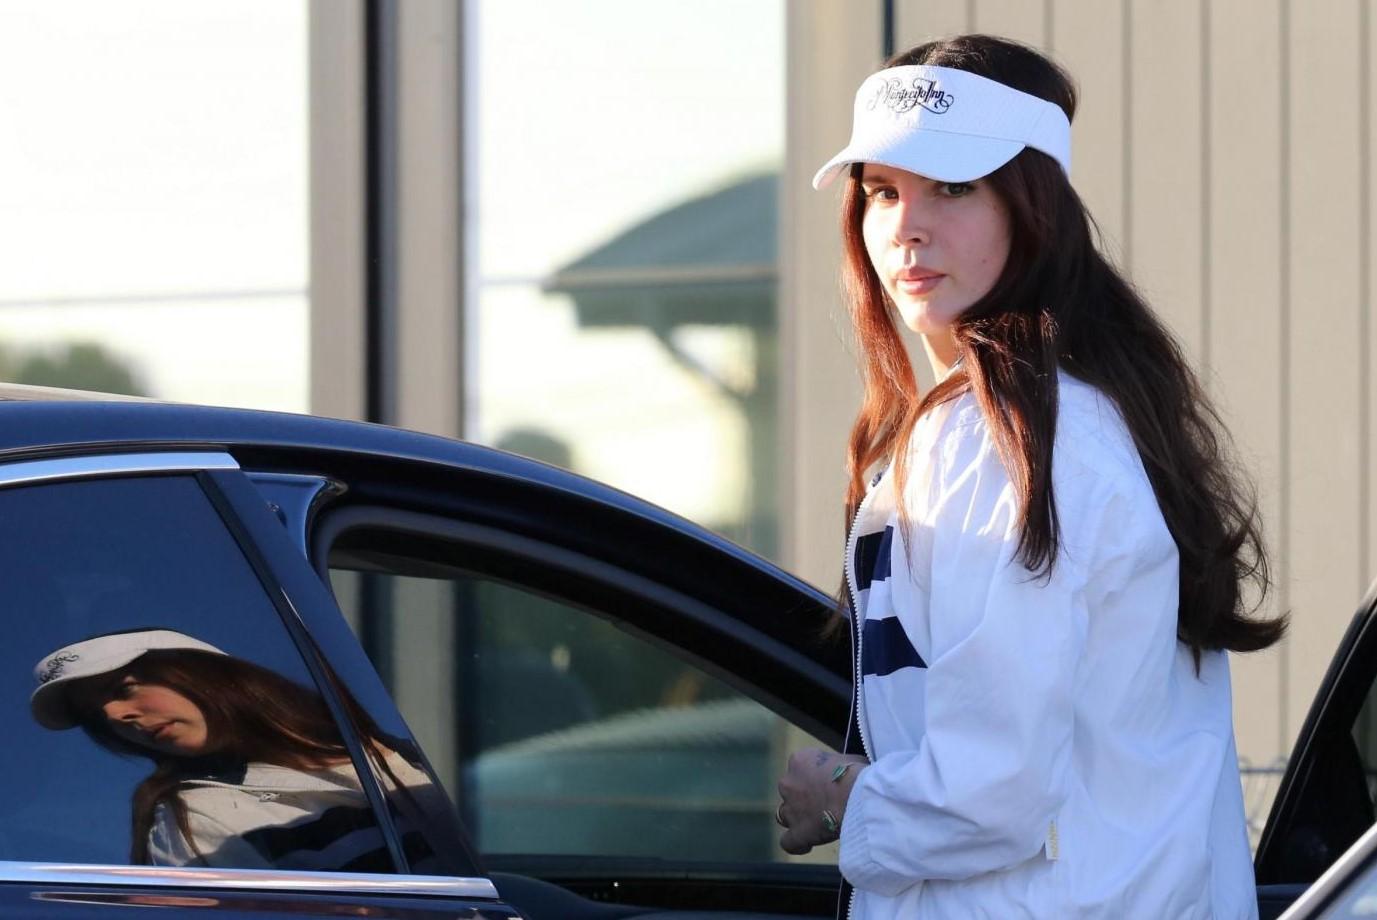 Lana Del Rey accusata di razzismo per un post: scintille sui social